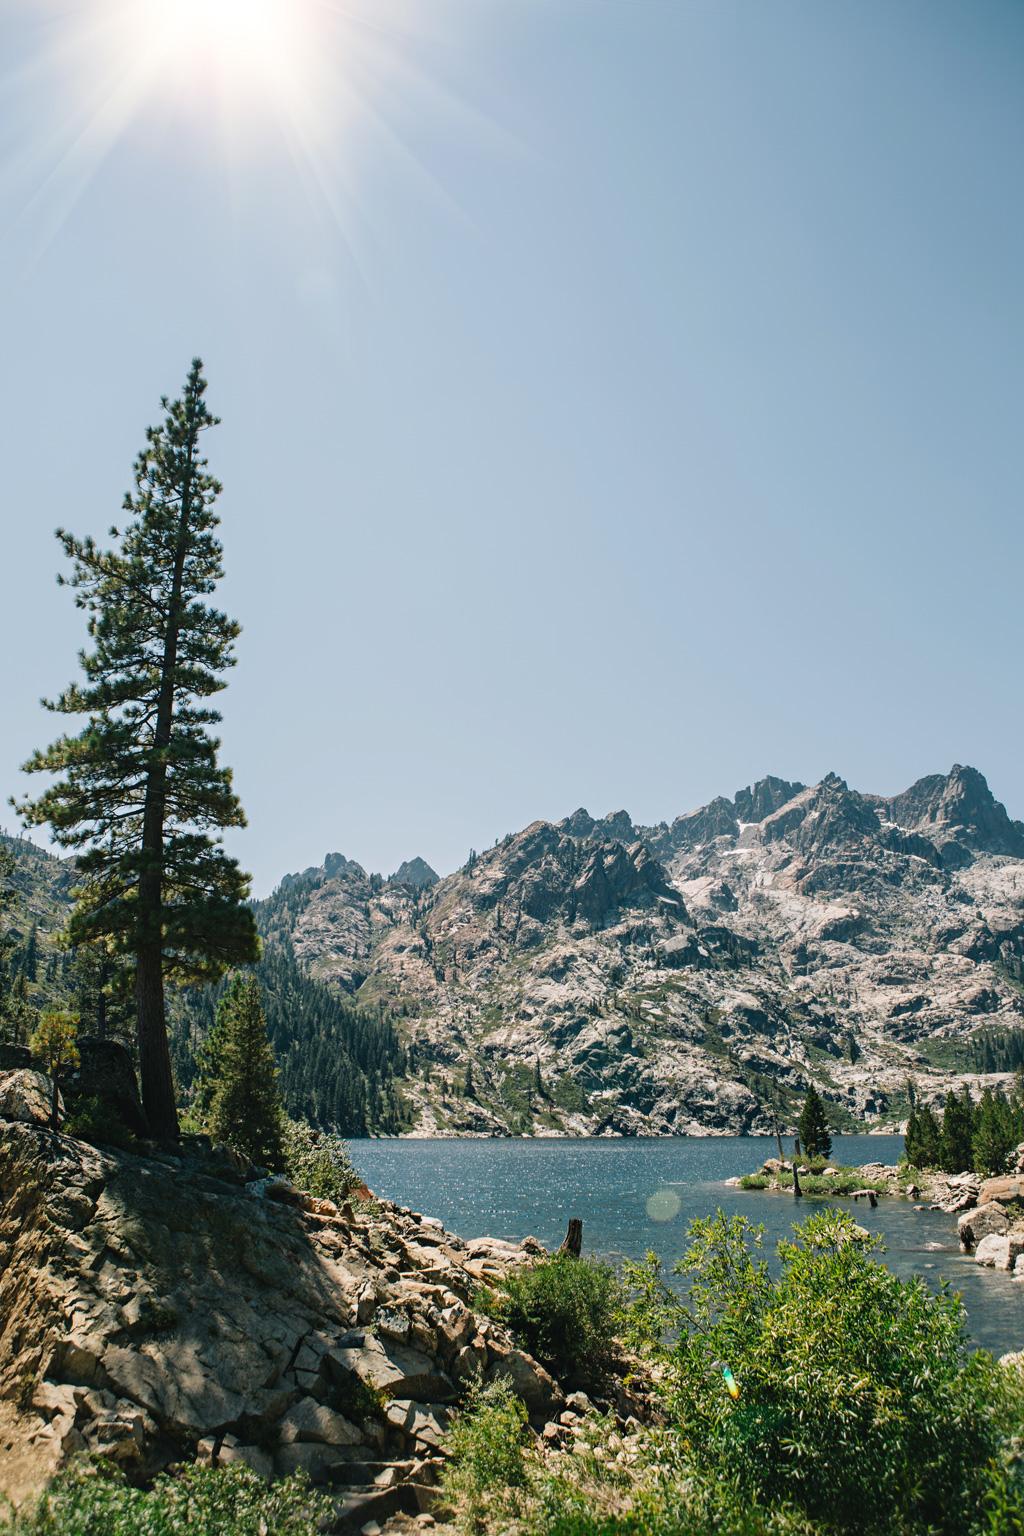 CindyGiovagnoli_outdoors_photographer_Sierra_Buttes_firetower_watchtower_Sardine_Snag_Bear_lake_hike_swim_camp-054.jpg